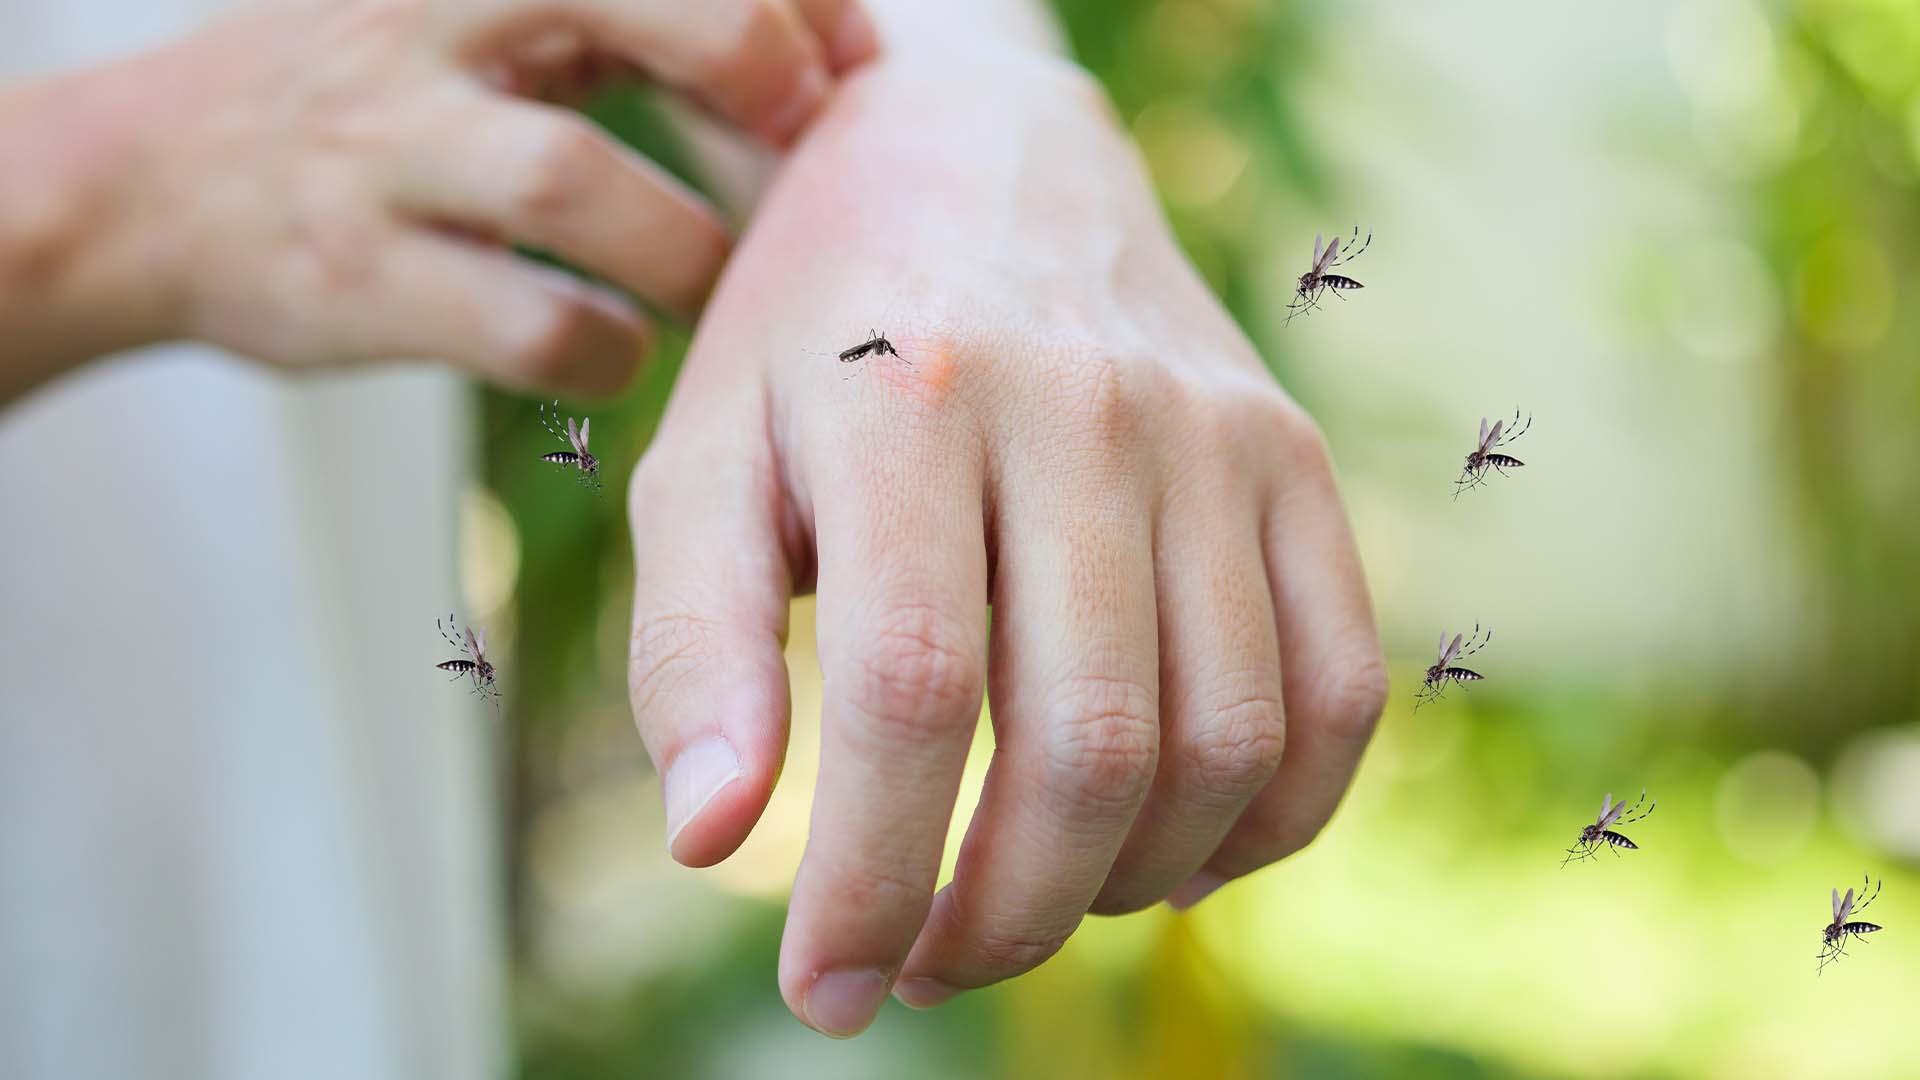 mosquitoes biting around hands